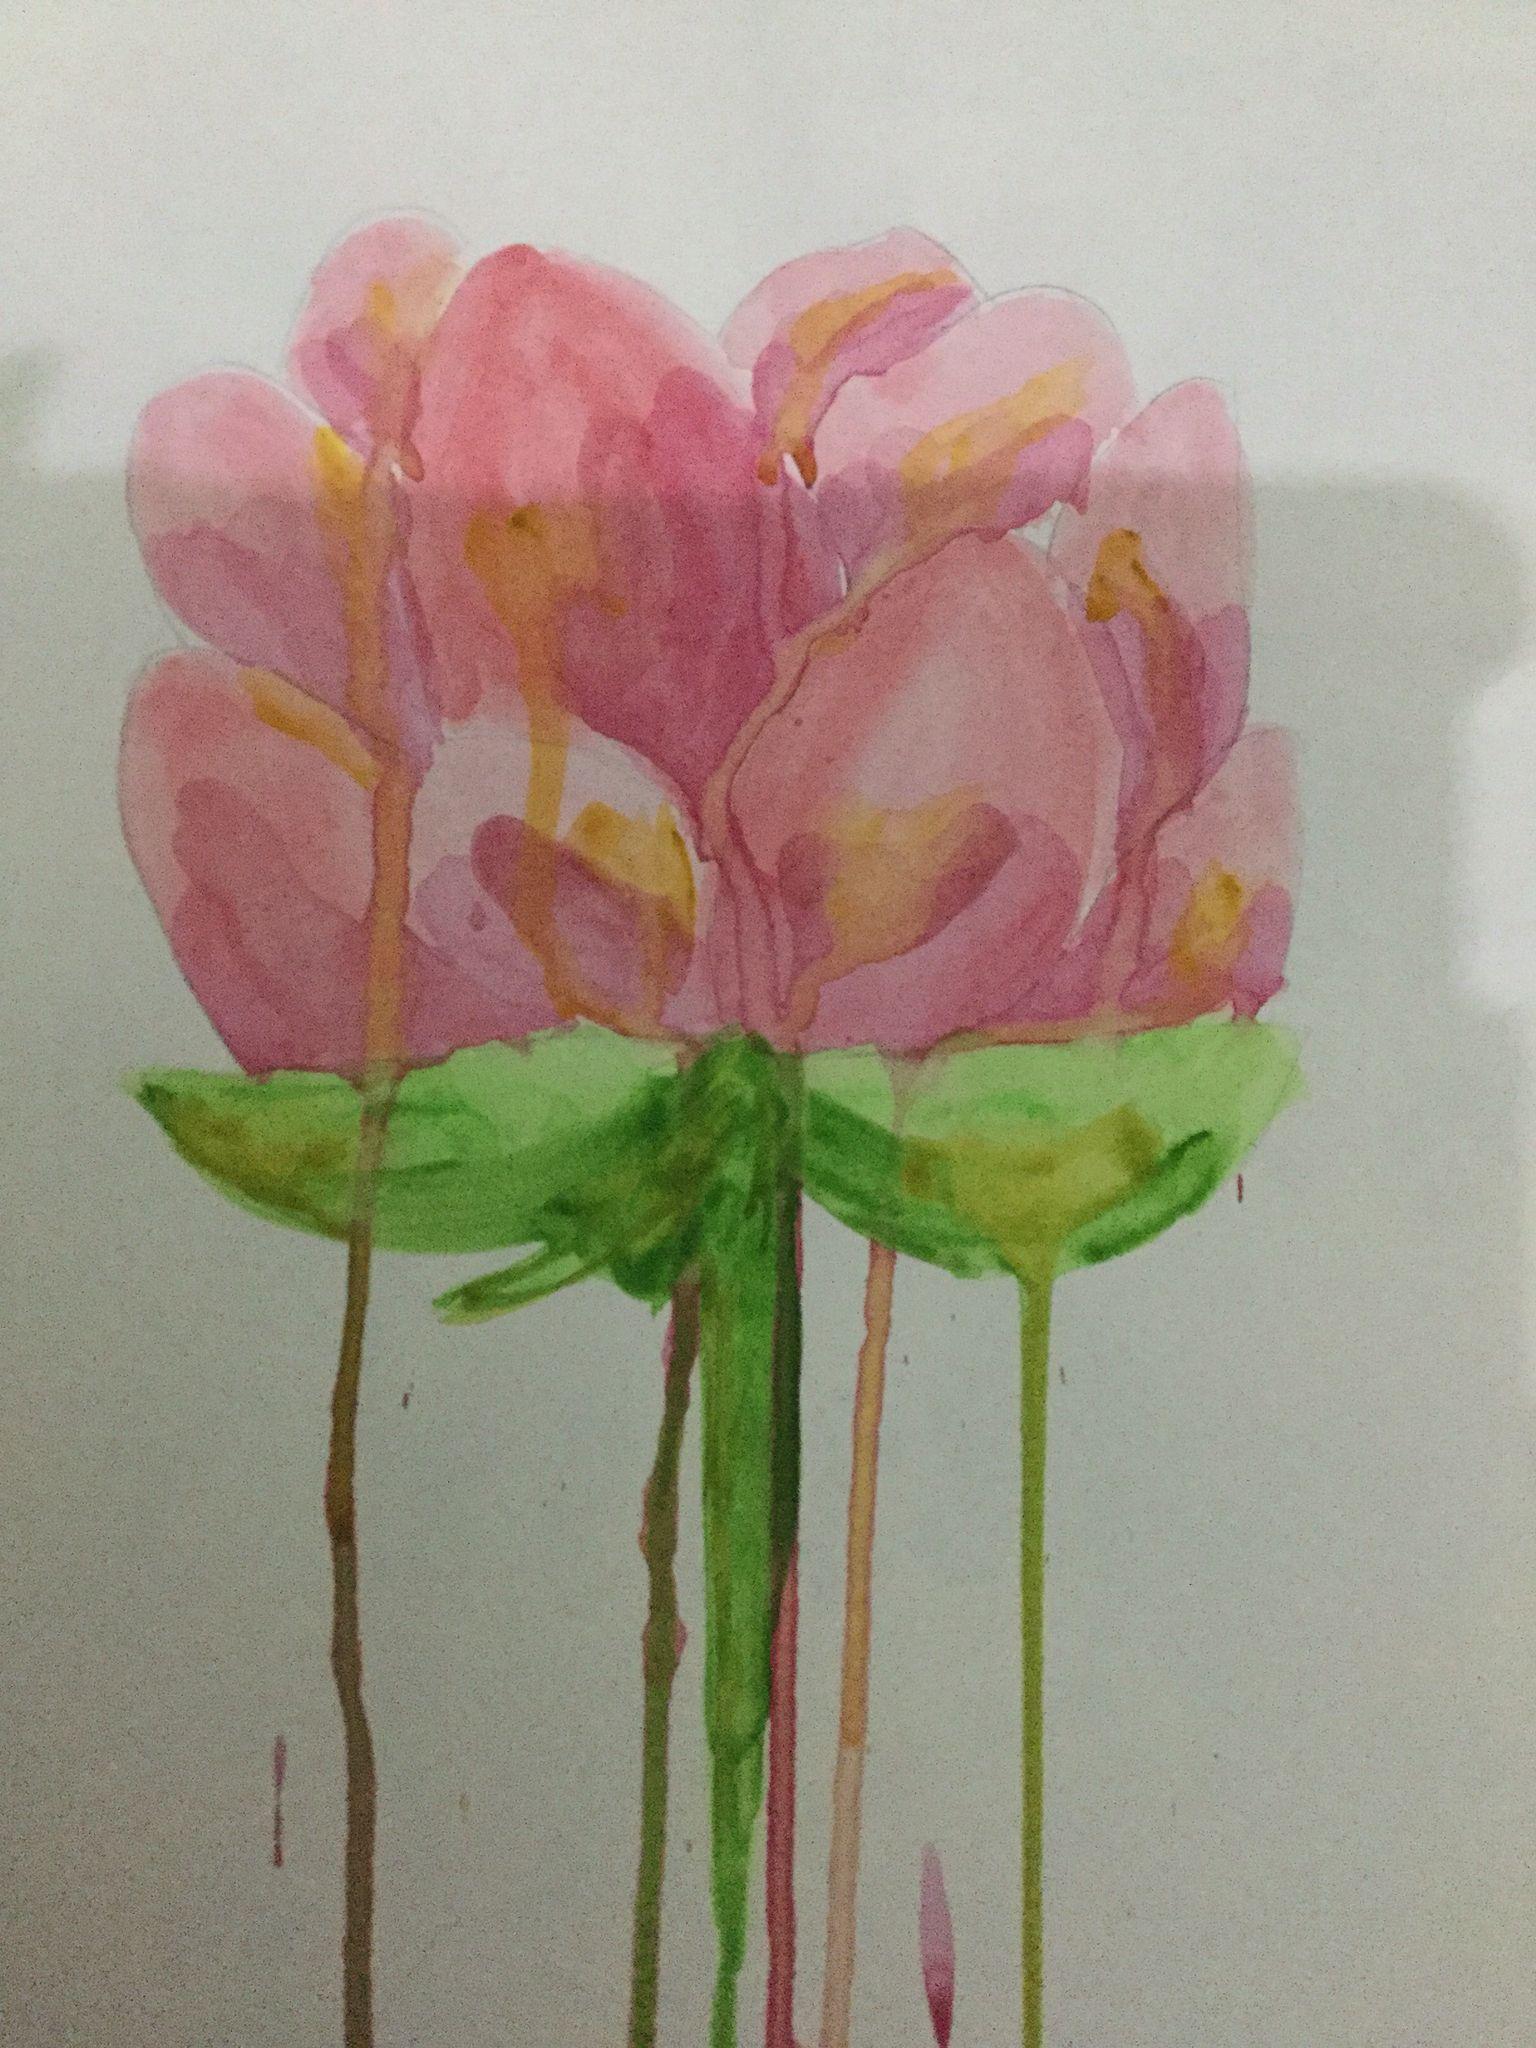 Lotus flower watercolor art artcreations peace creations lotus flower watercolor art artcreations peace mightylinksfo